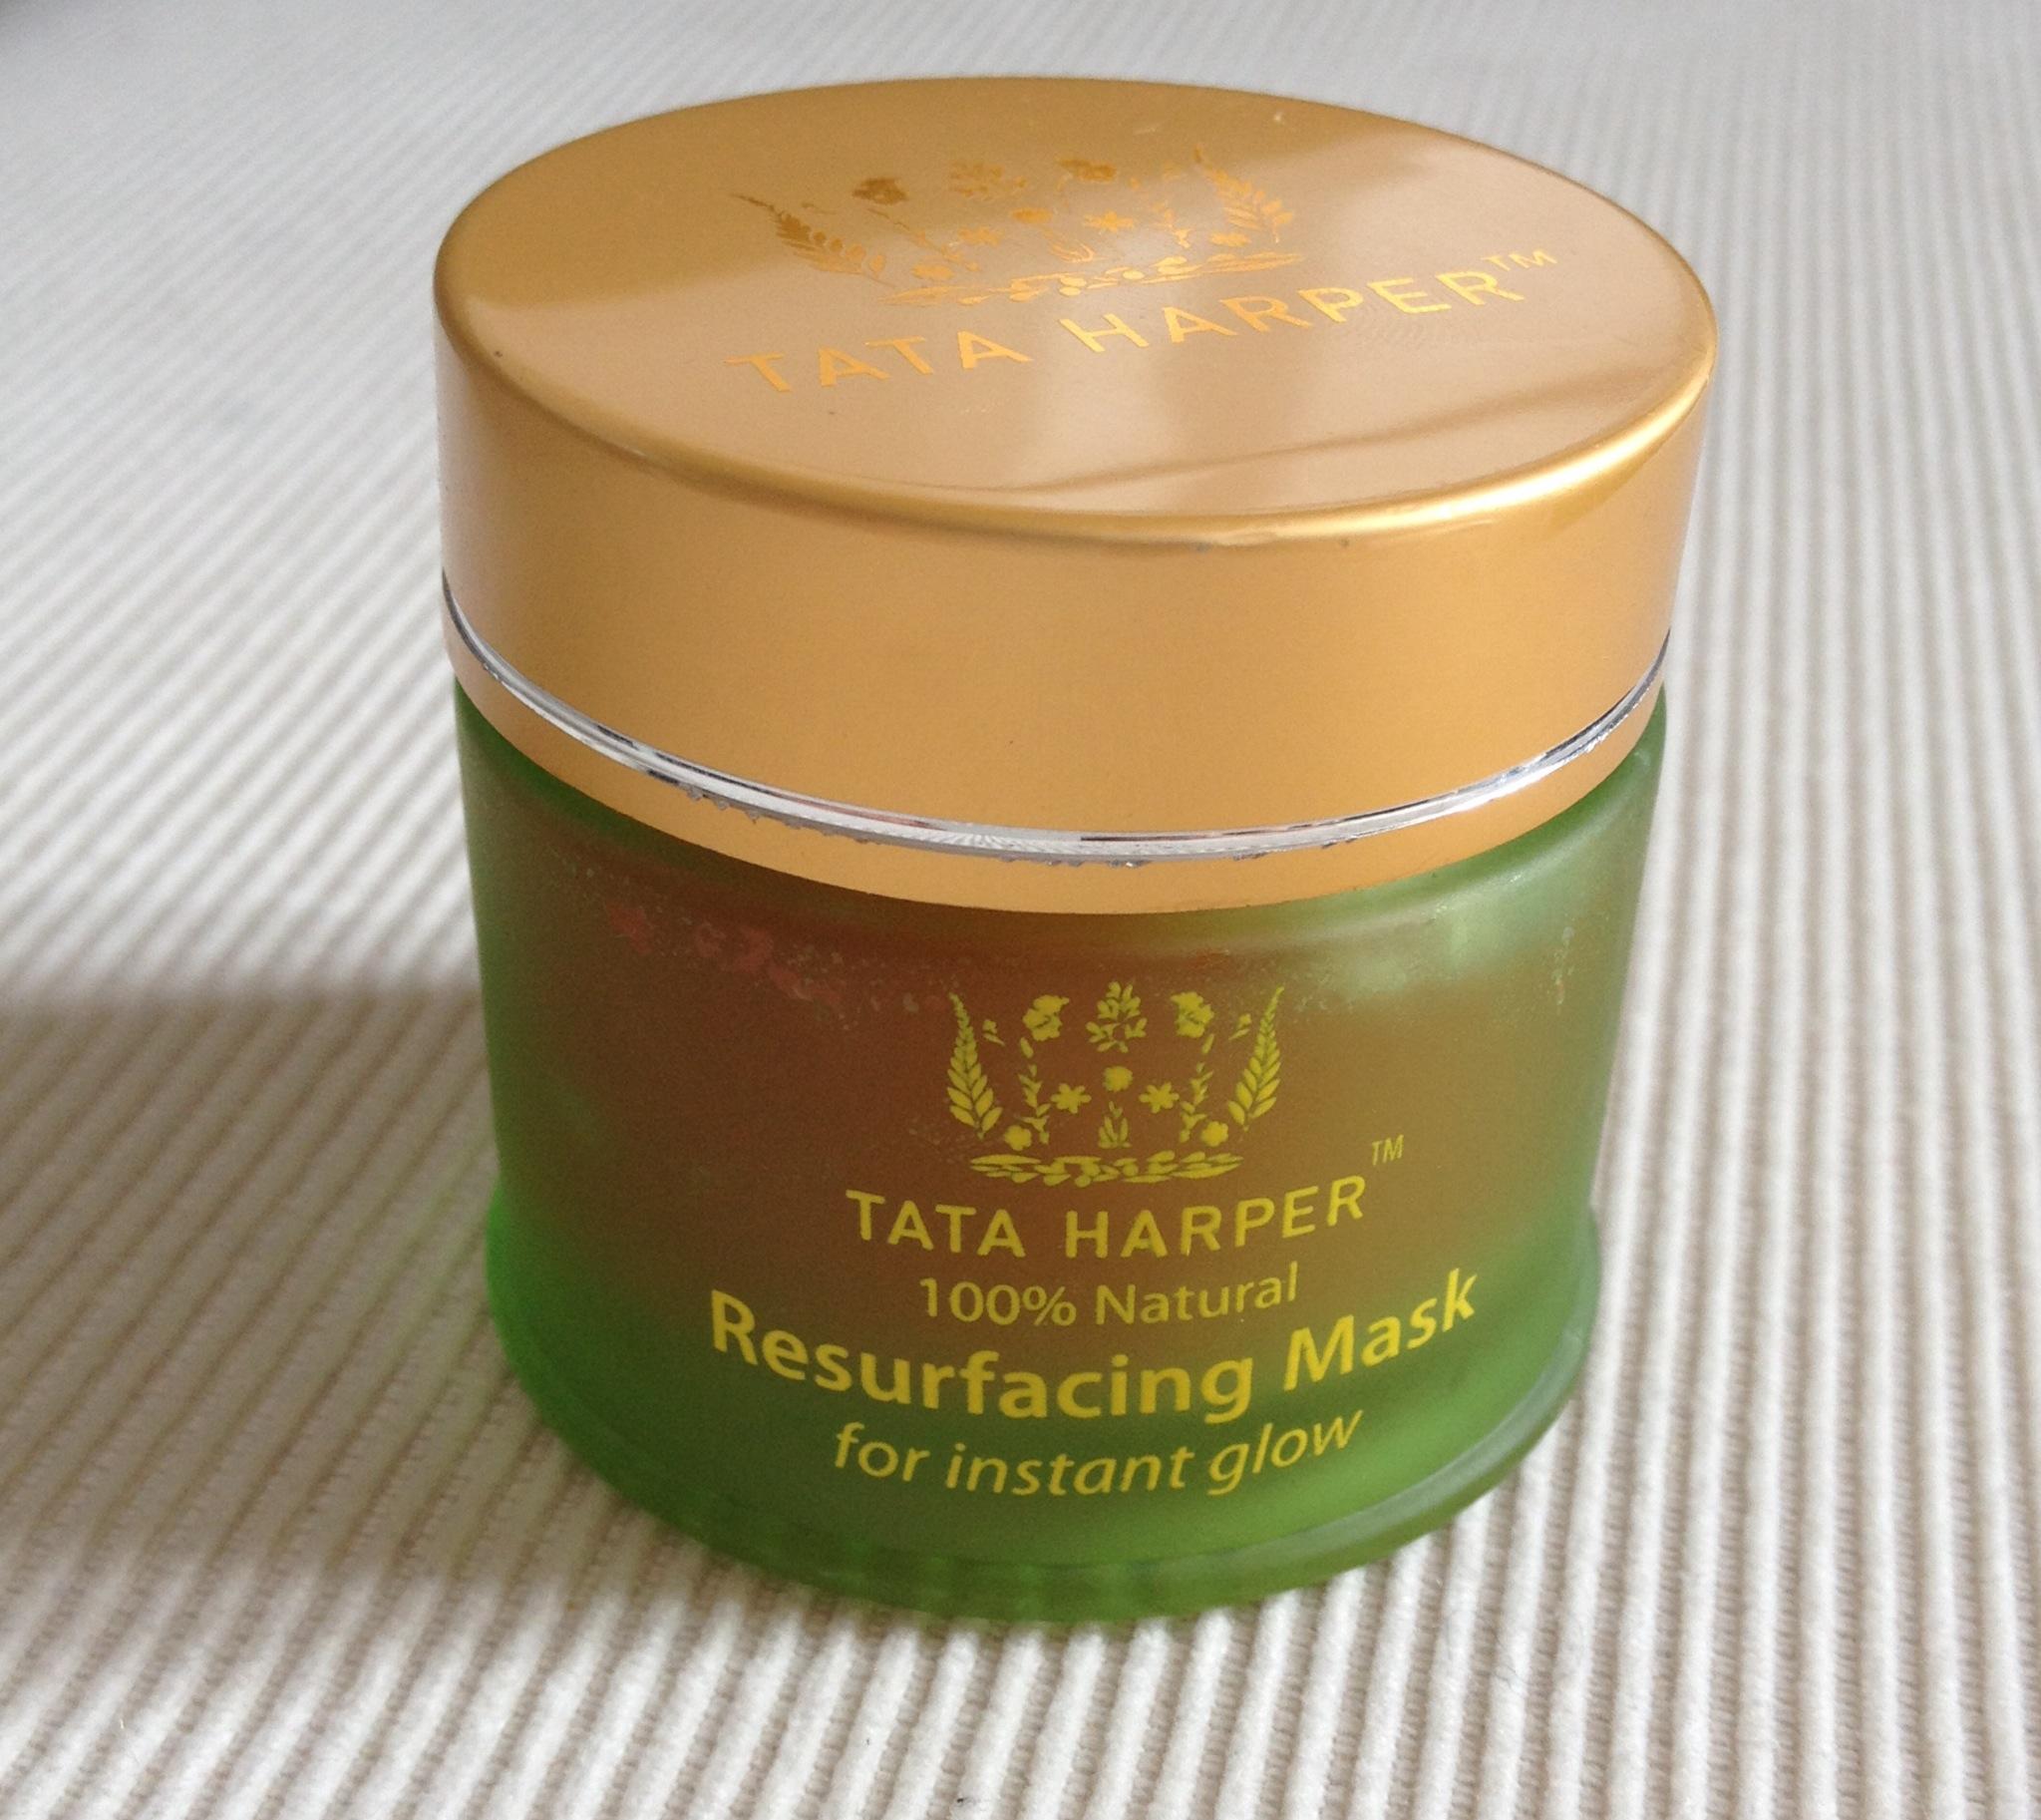 tata harper resurfacing mask how to use